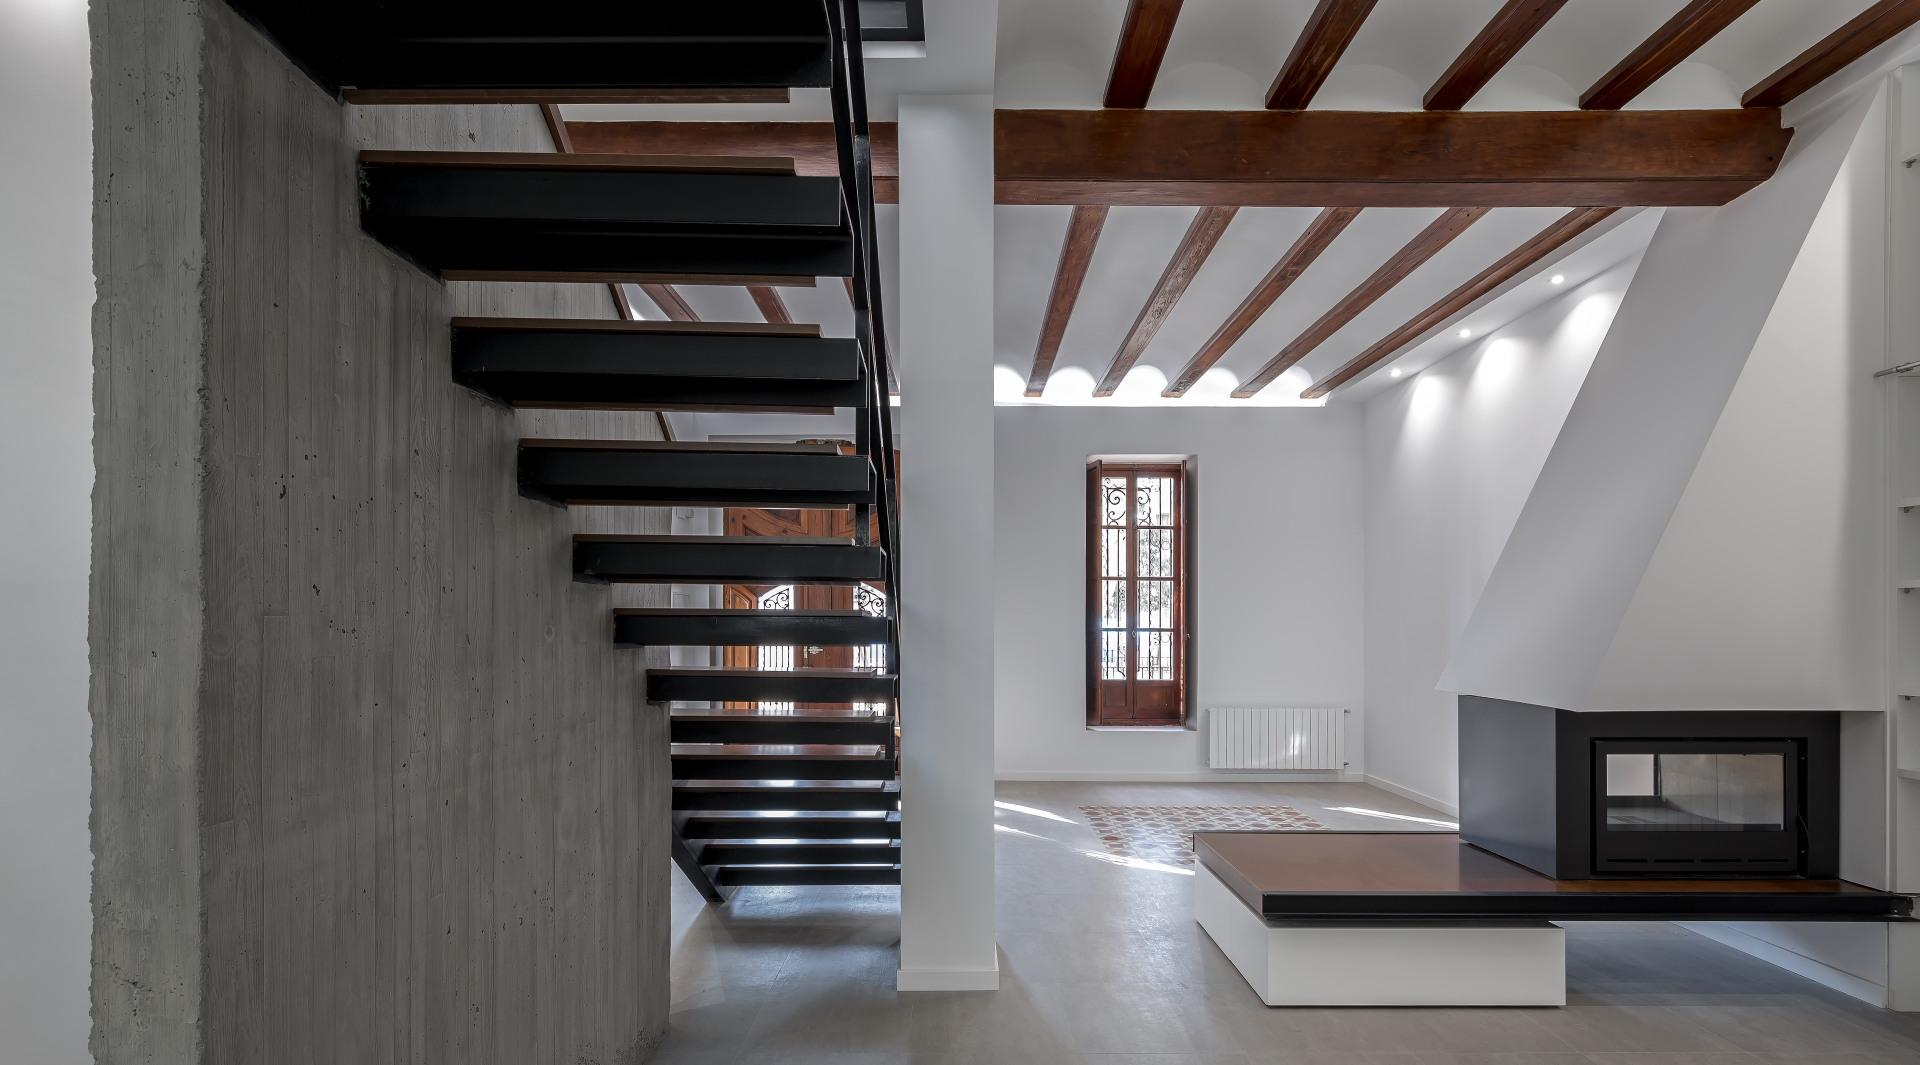 fotografia-arquitectura-valencia-german-cabo-viraje-rehabilitacion-campanar (14)